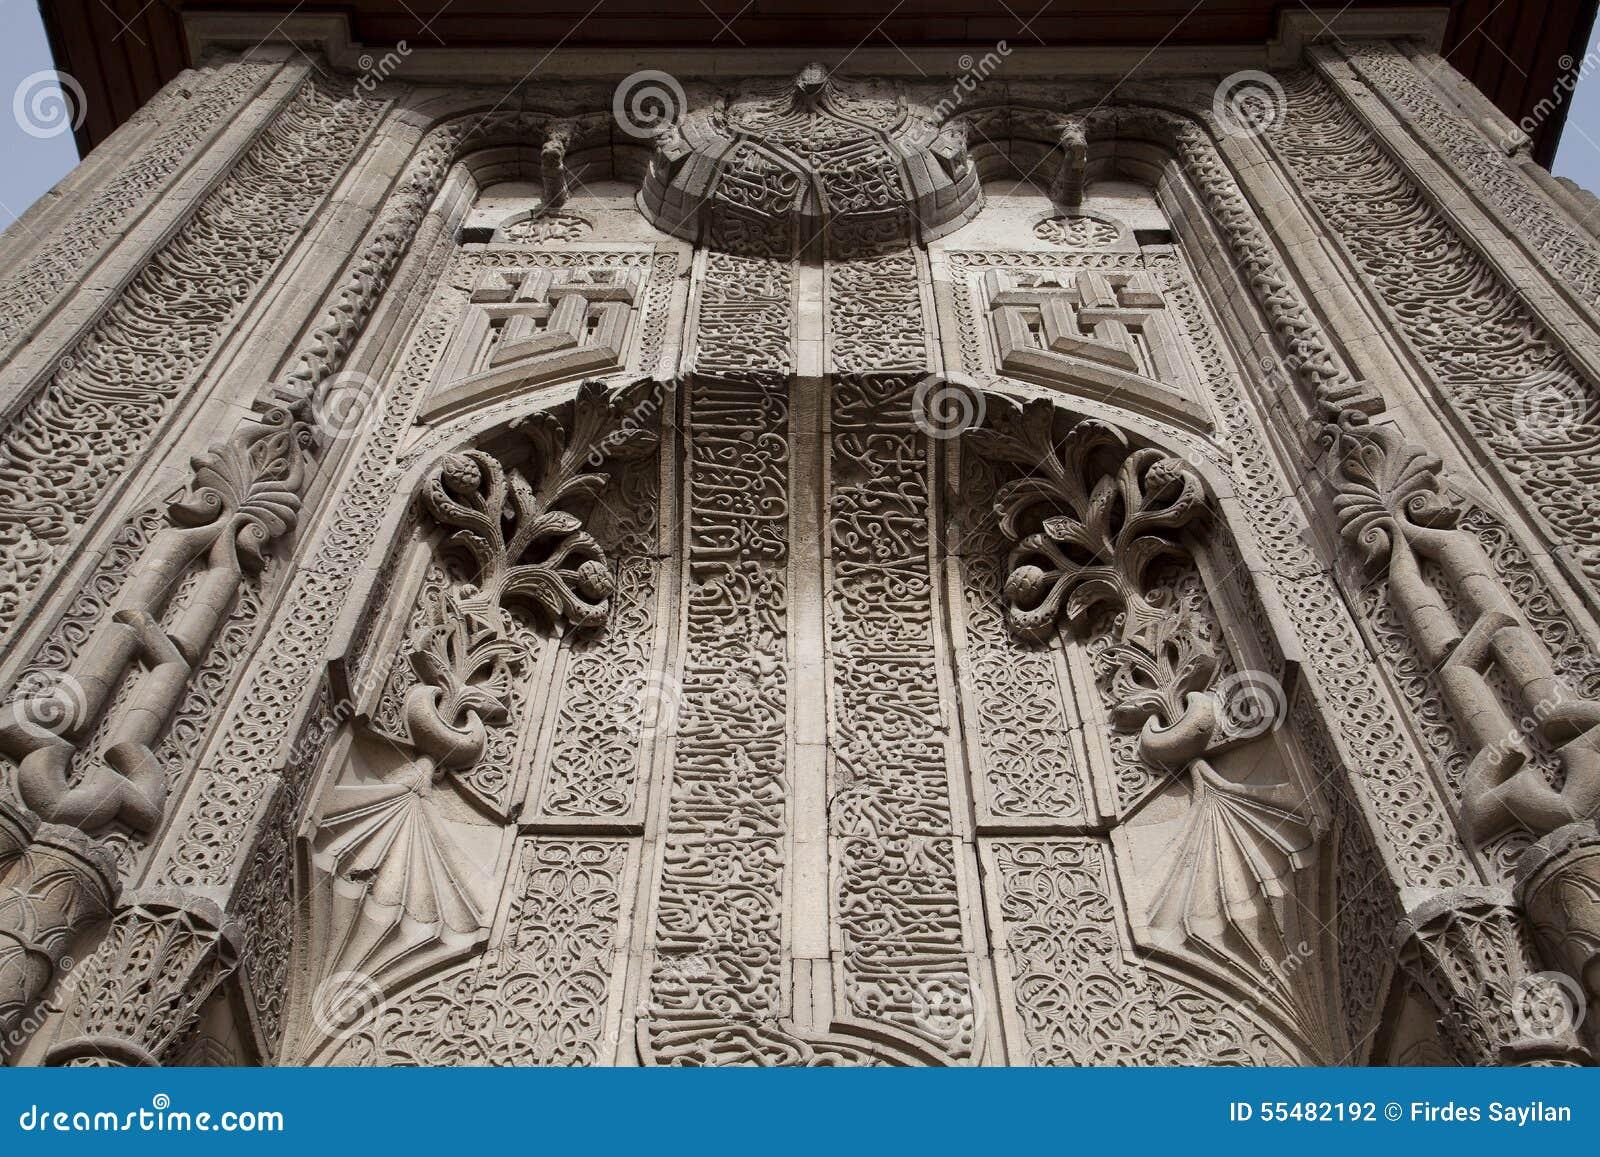 Ince Minareli Medrese (Madrasah met dunne minaret) Konya, Turkije